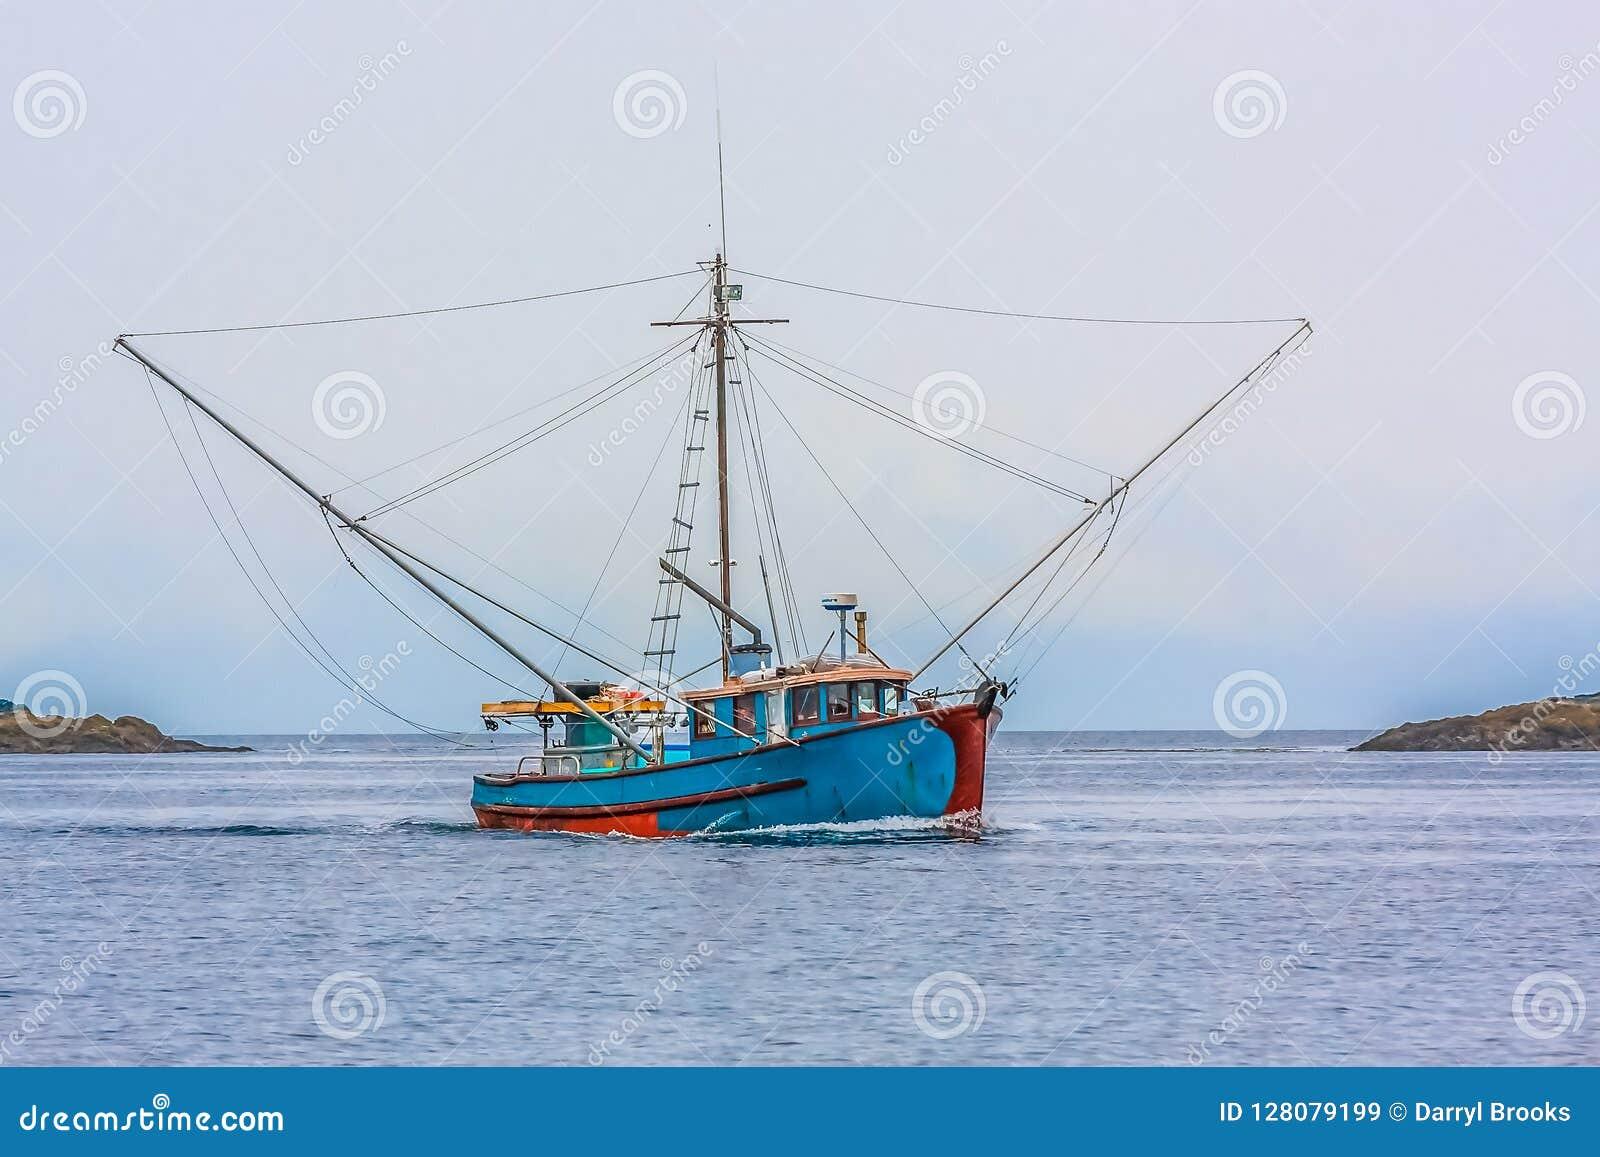 Blue Shrimp Boat on Grey Day